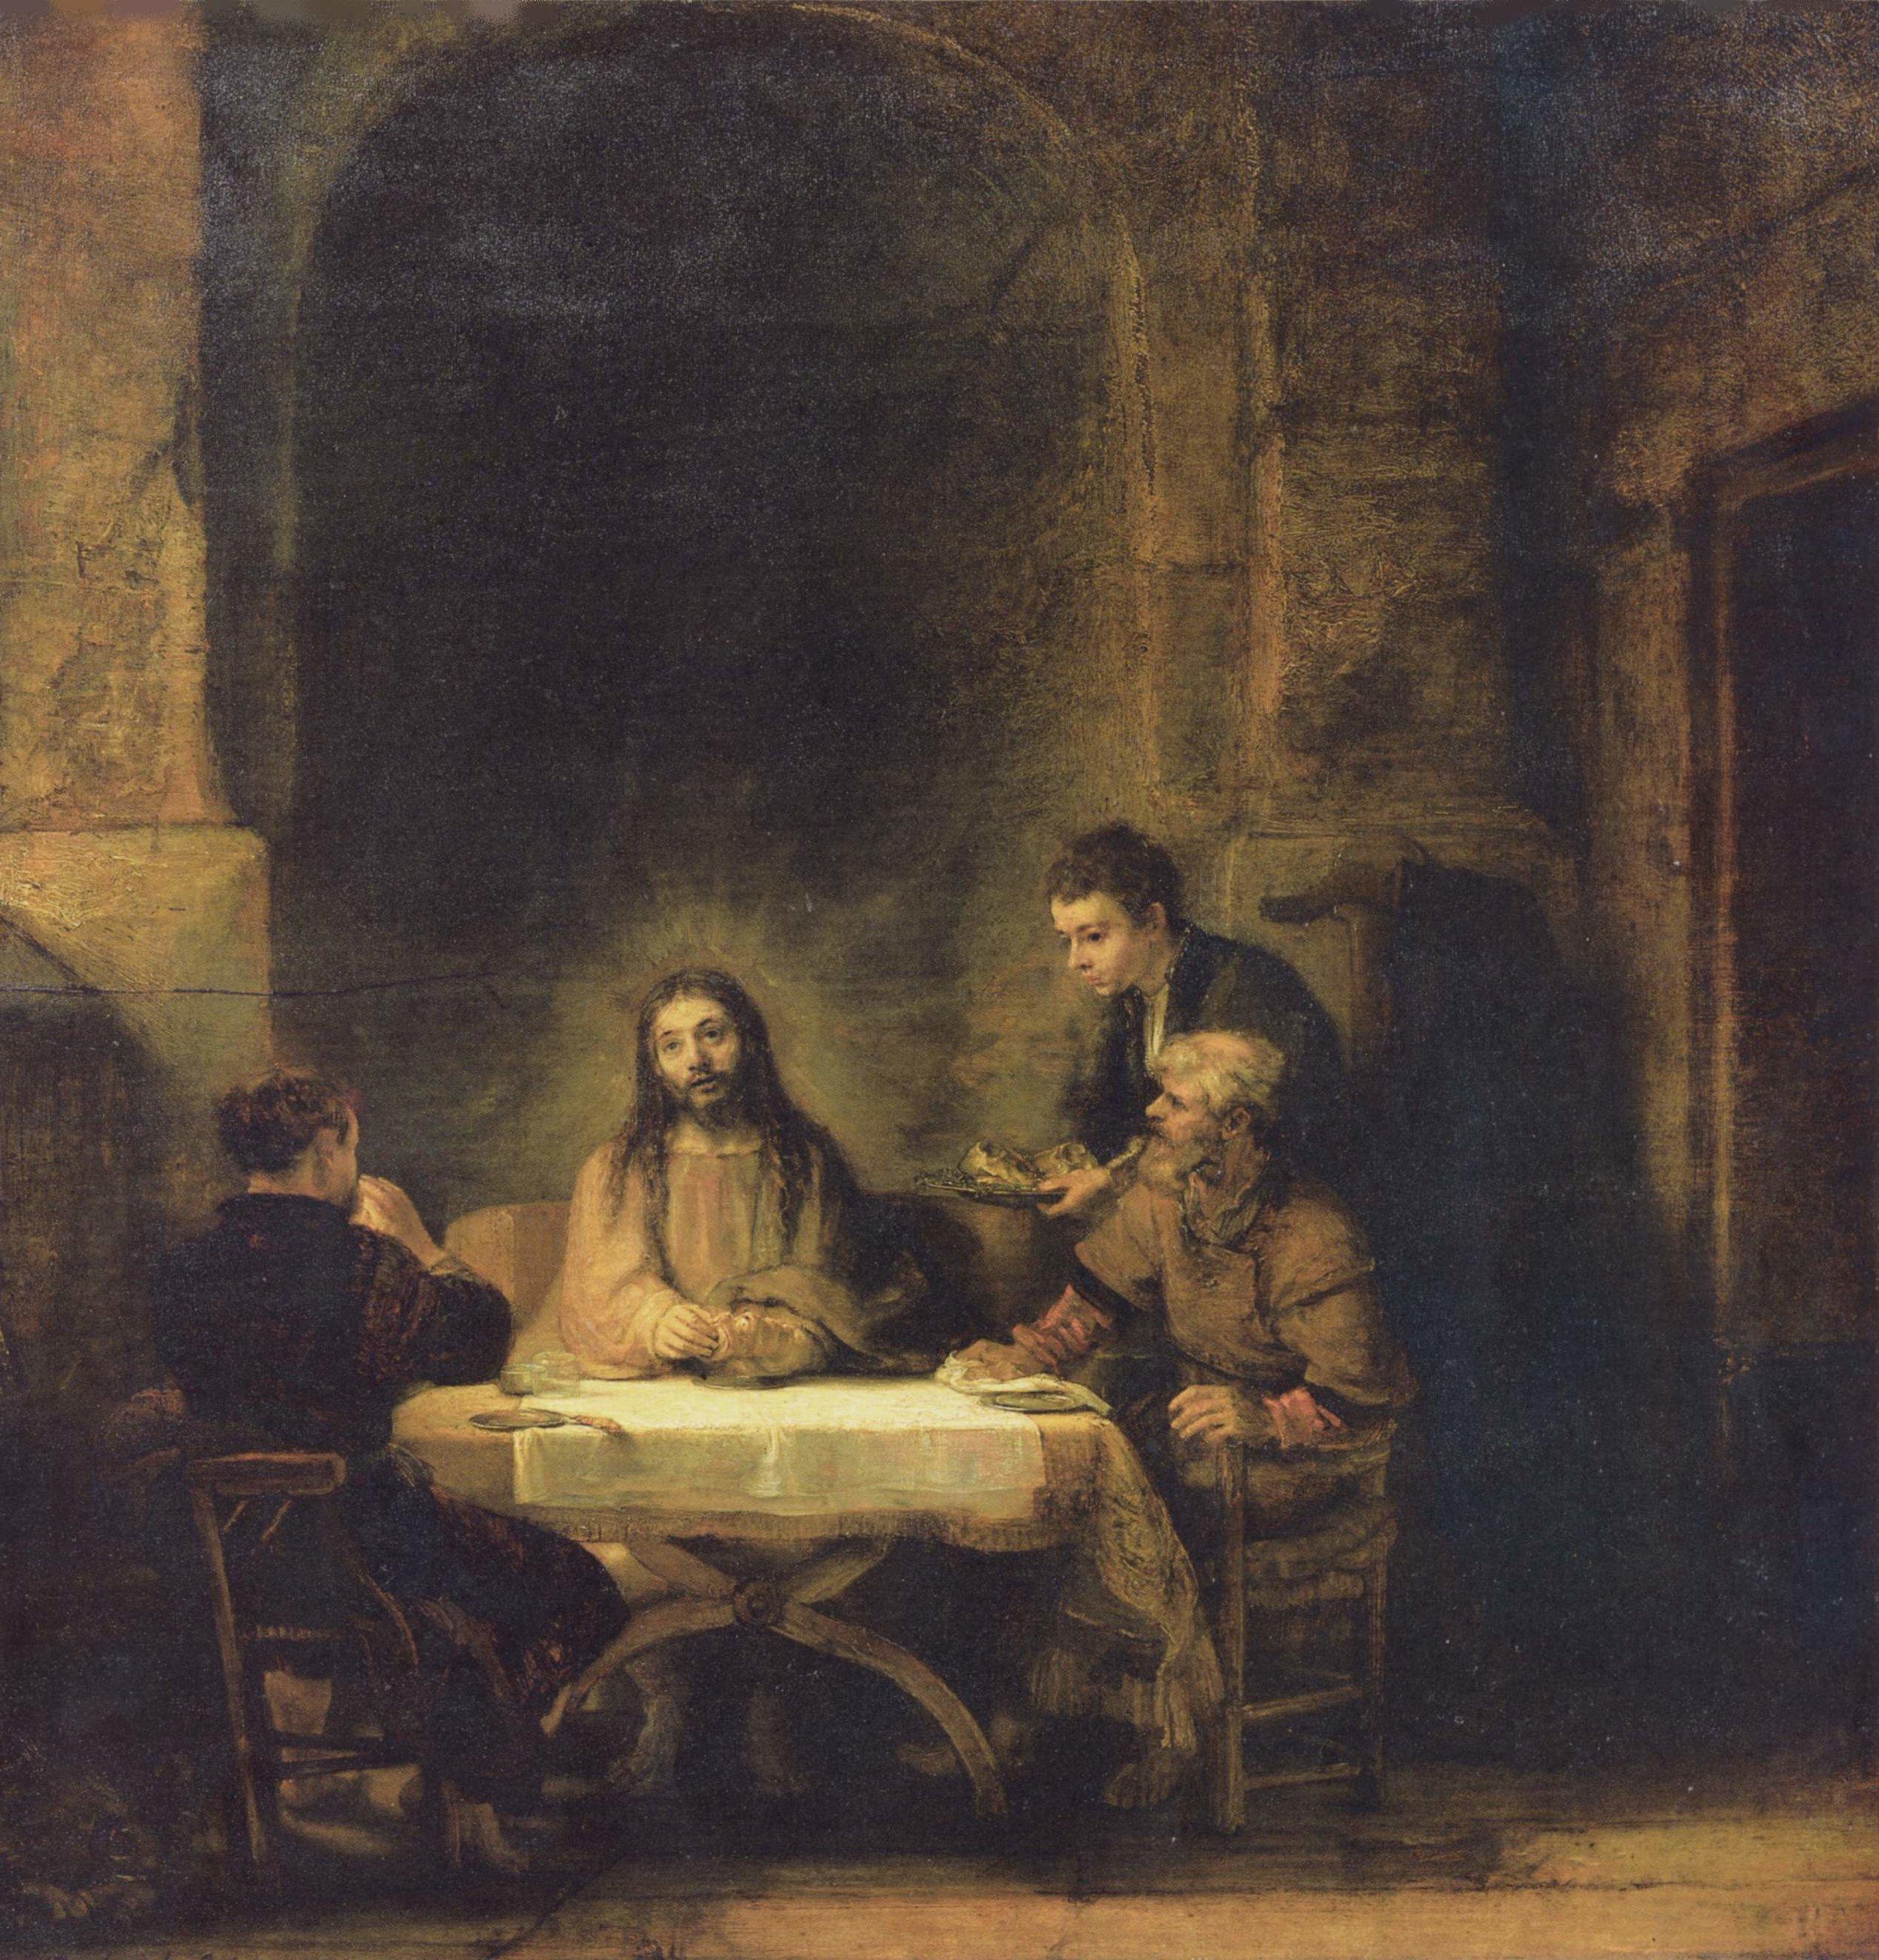 Photo: Rembrandt Harmenszoon van Rijn, Christ at Emmaus